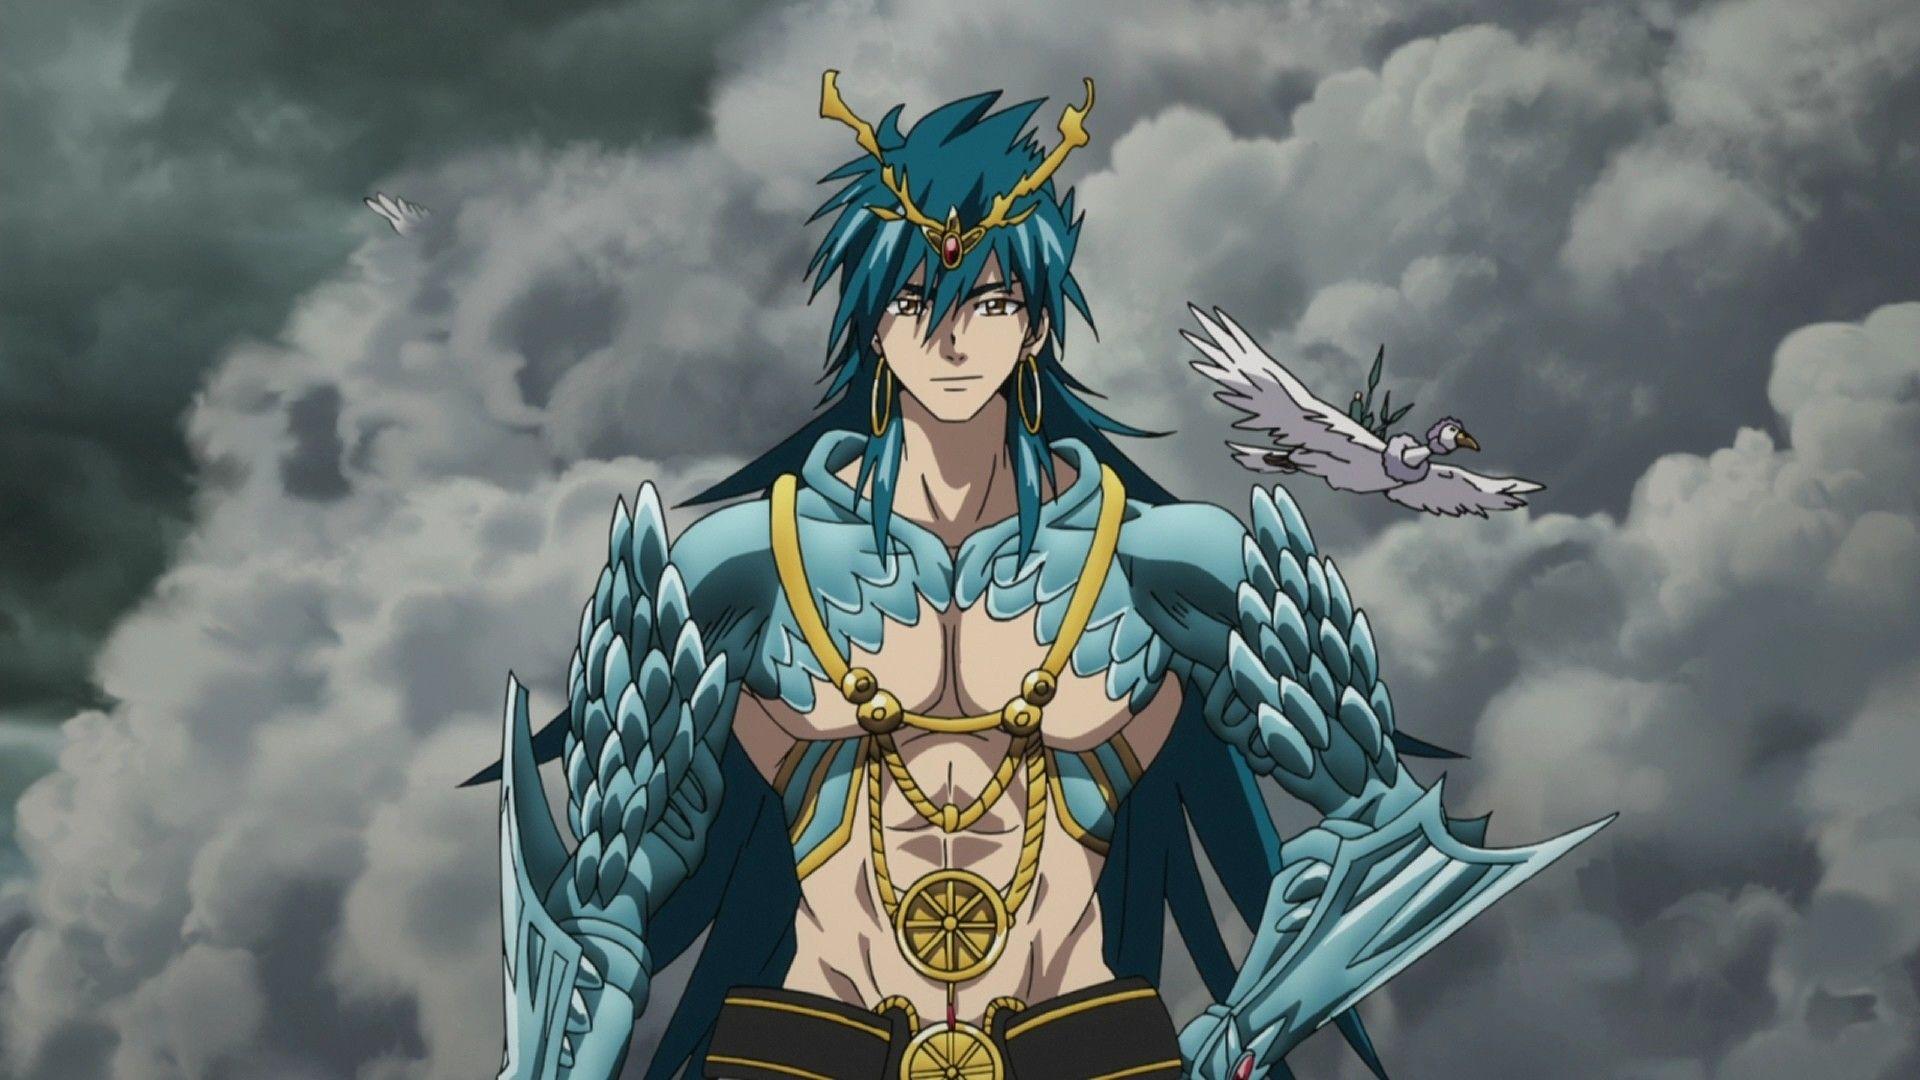 Pin by Montazerkun on Magi Sinbad magi, Anime magi